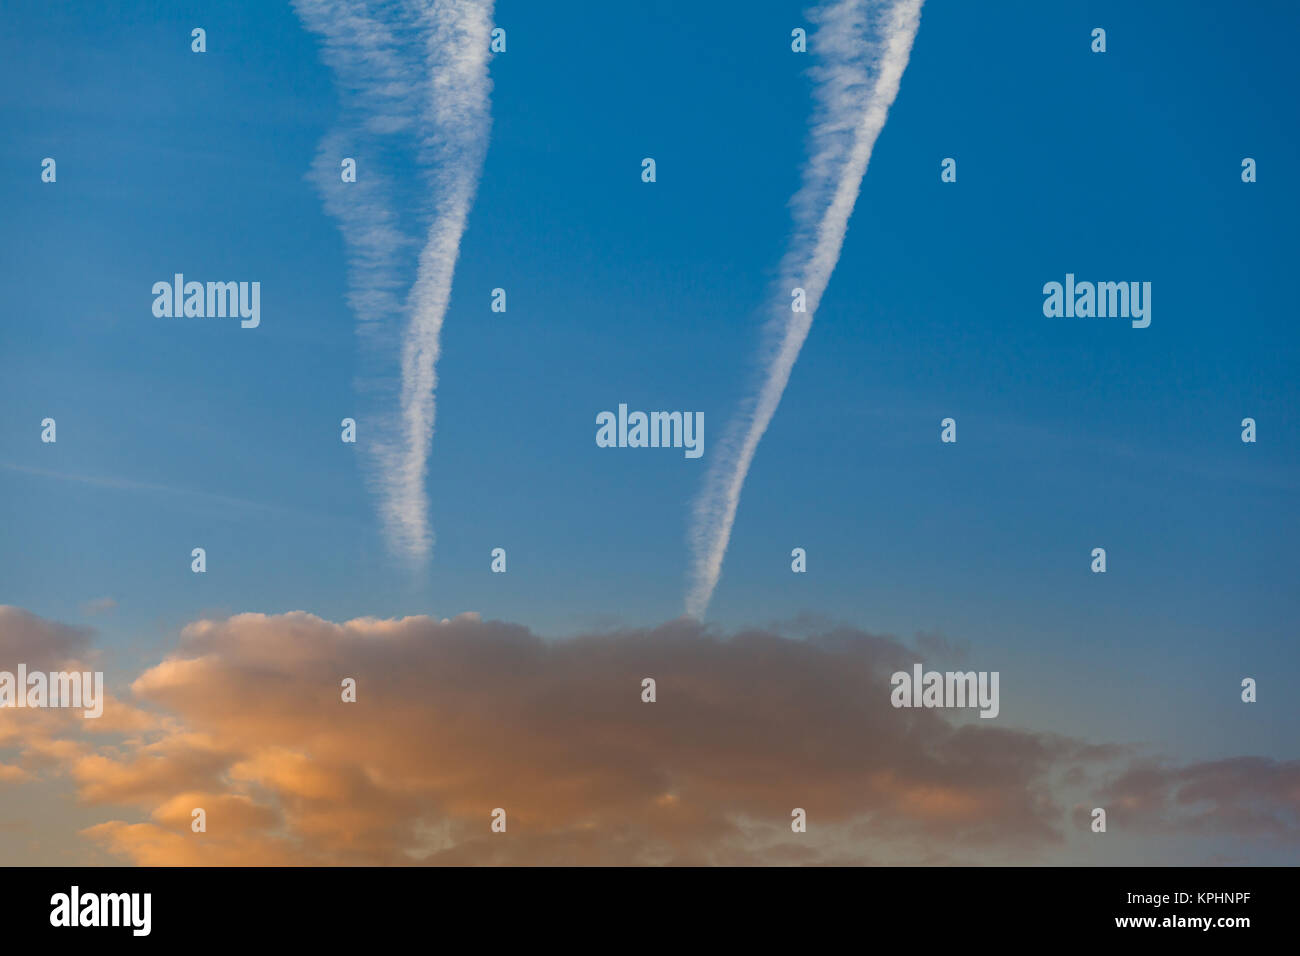 Cirren Stock Photos & Cirren Stock Images - Alamy